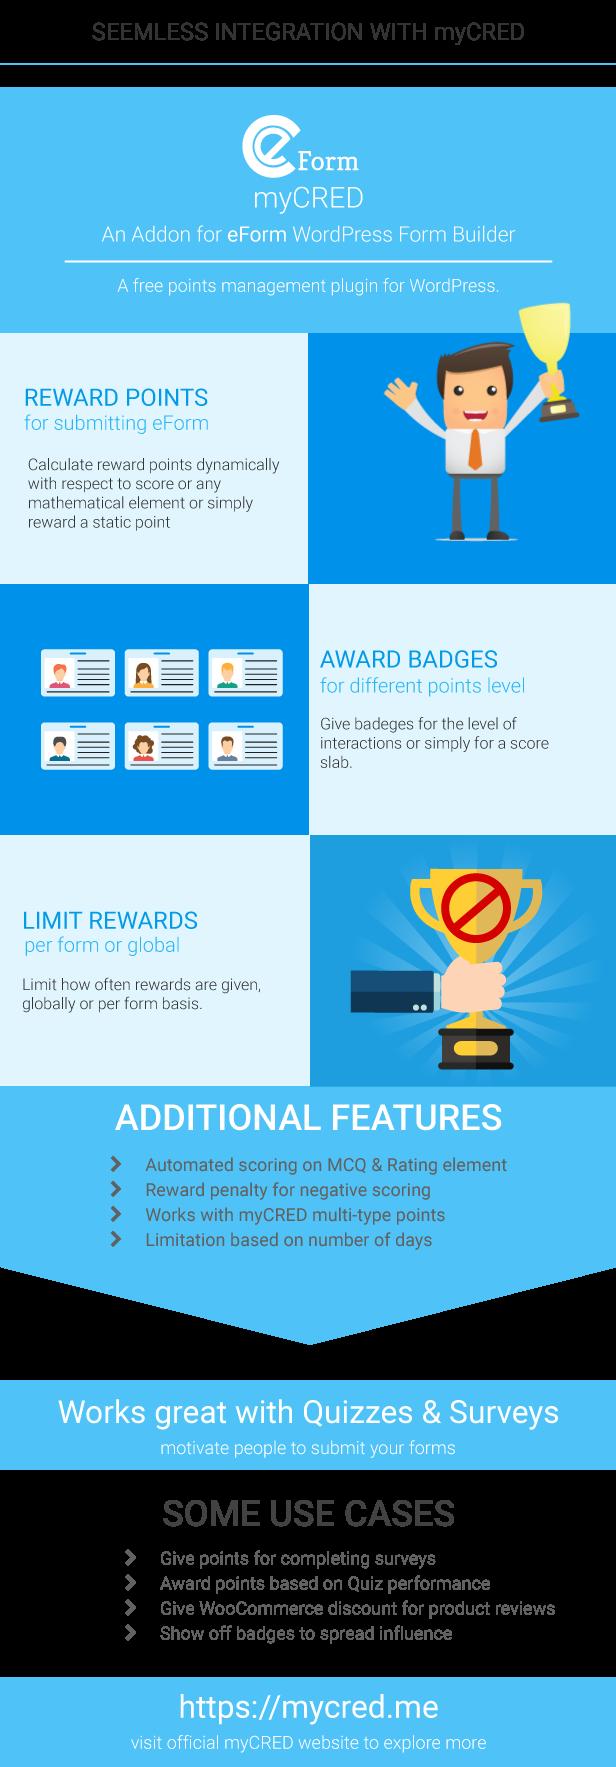 eForm Features